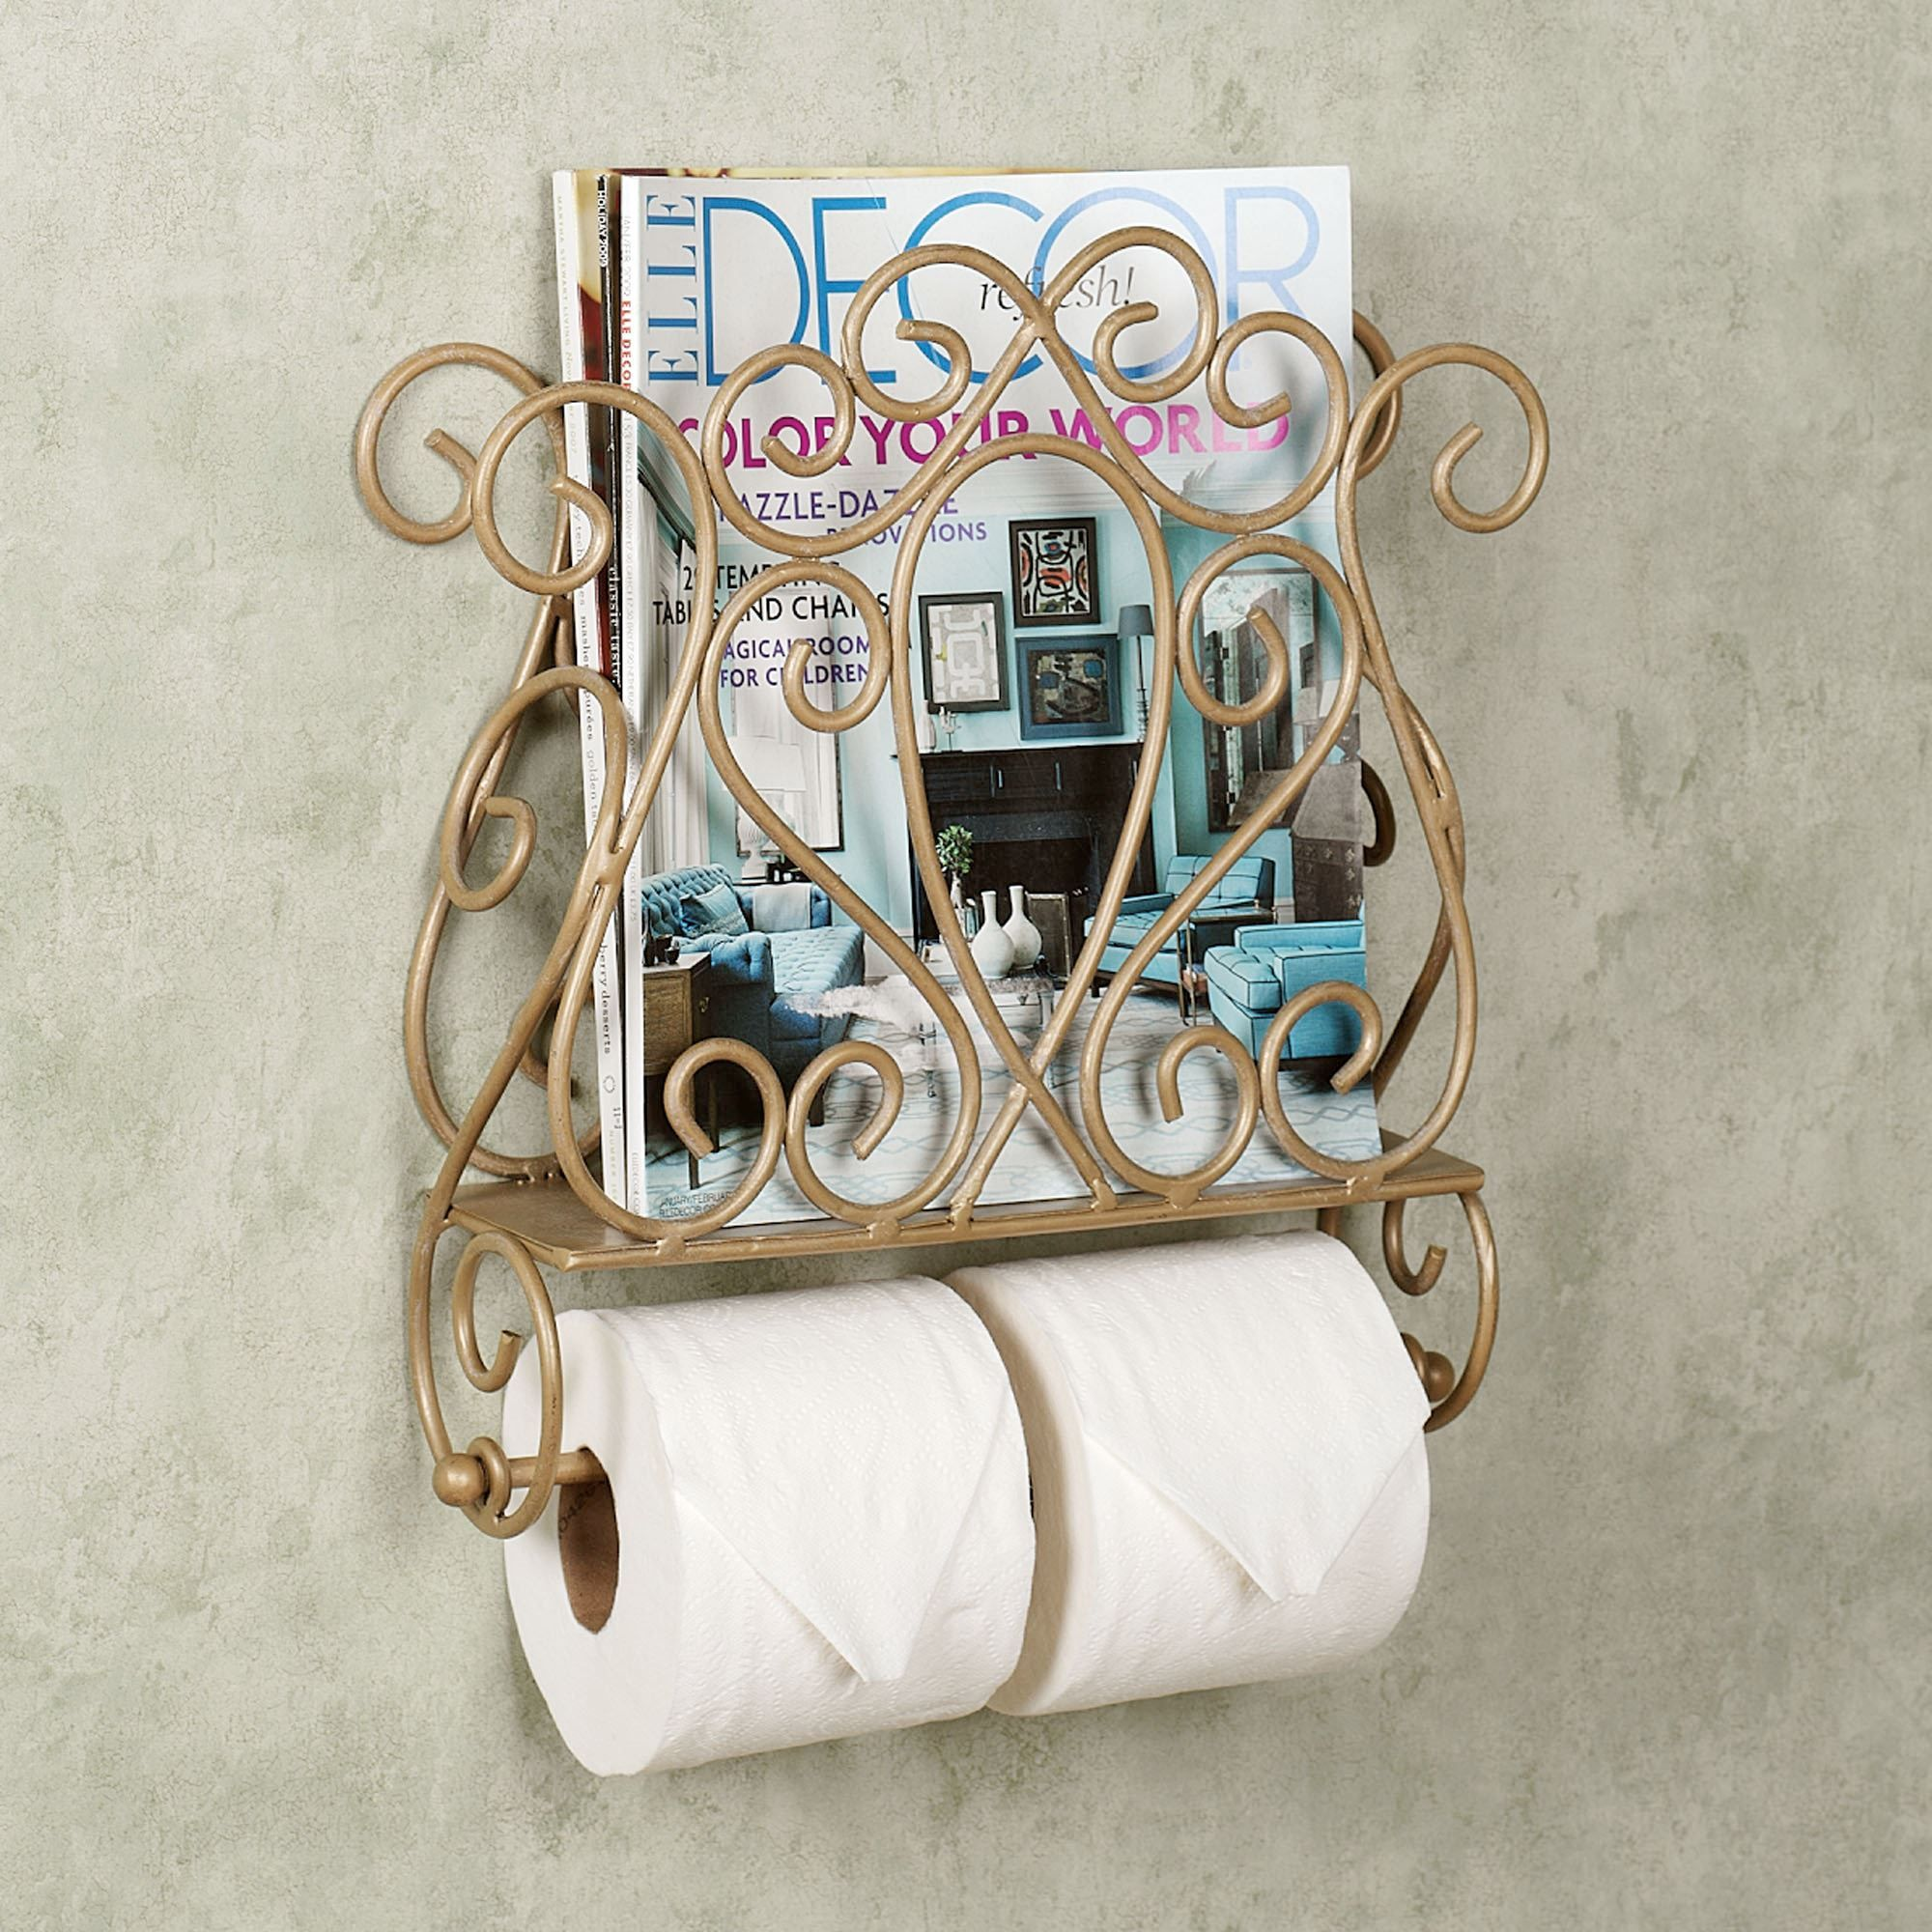 Gianna Wall Mount Magazine Rack And Toilet Paper Holder Toilet Paper Holder Wall Mounted Magazine Rack Wall Magazine Rack